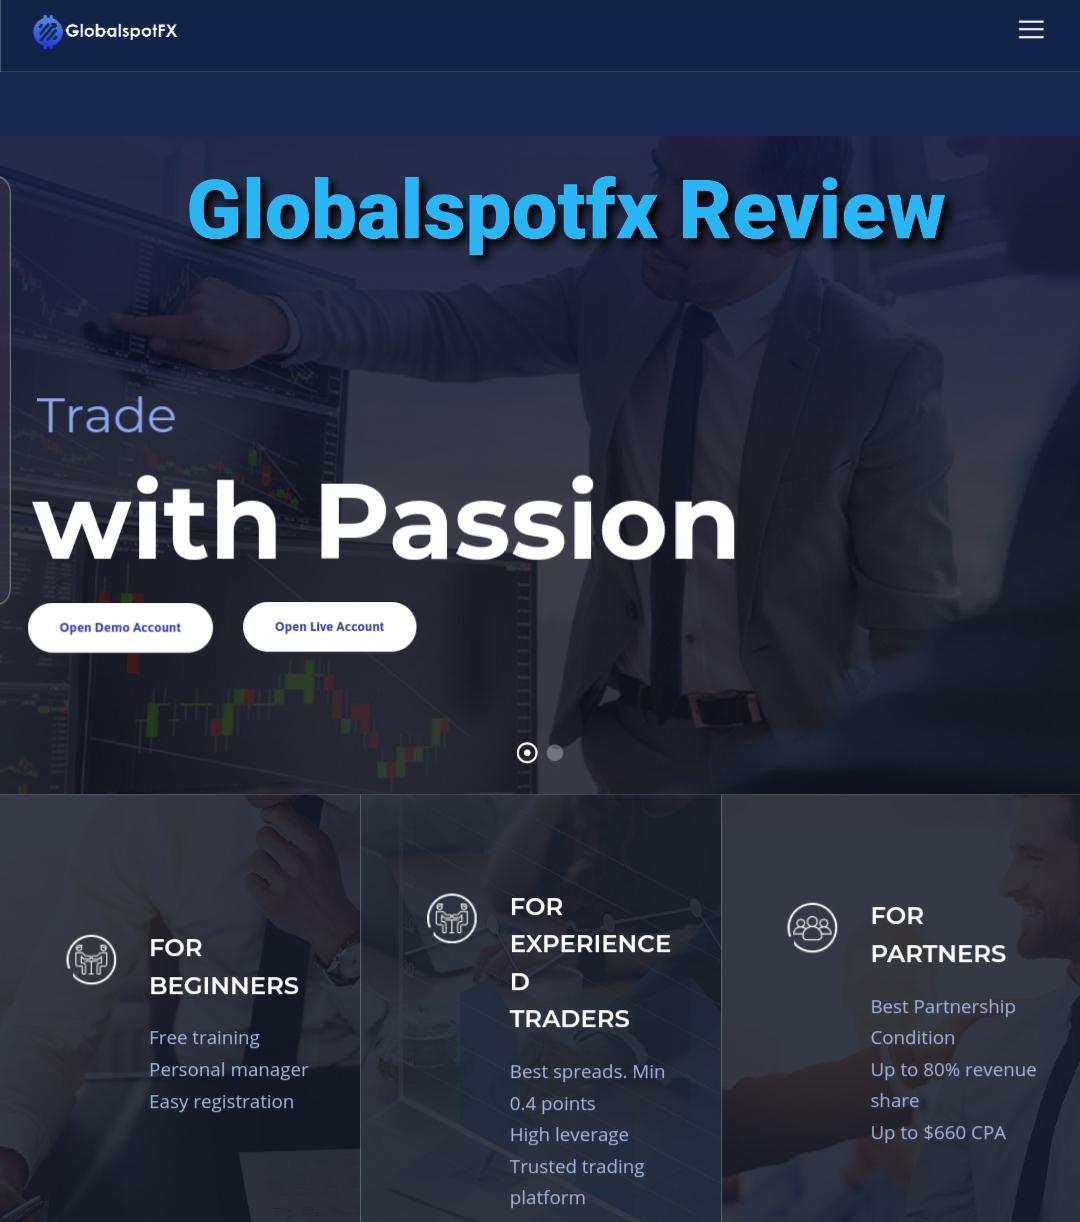 Globalspotfx review